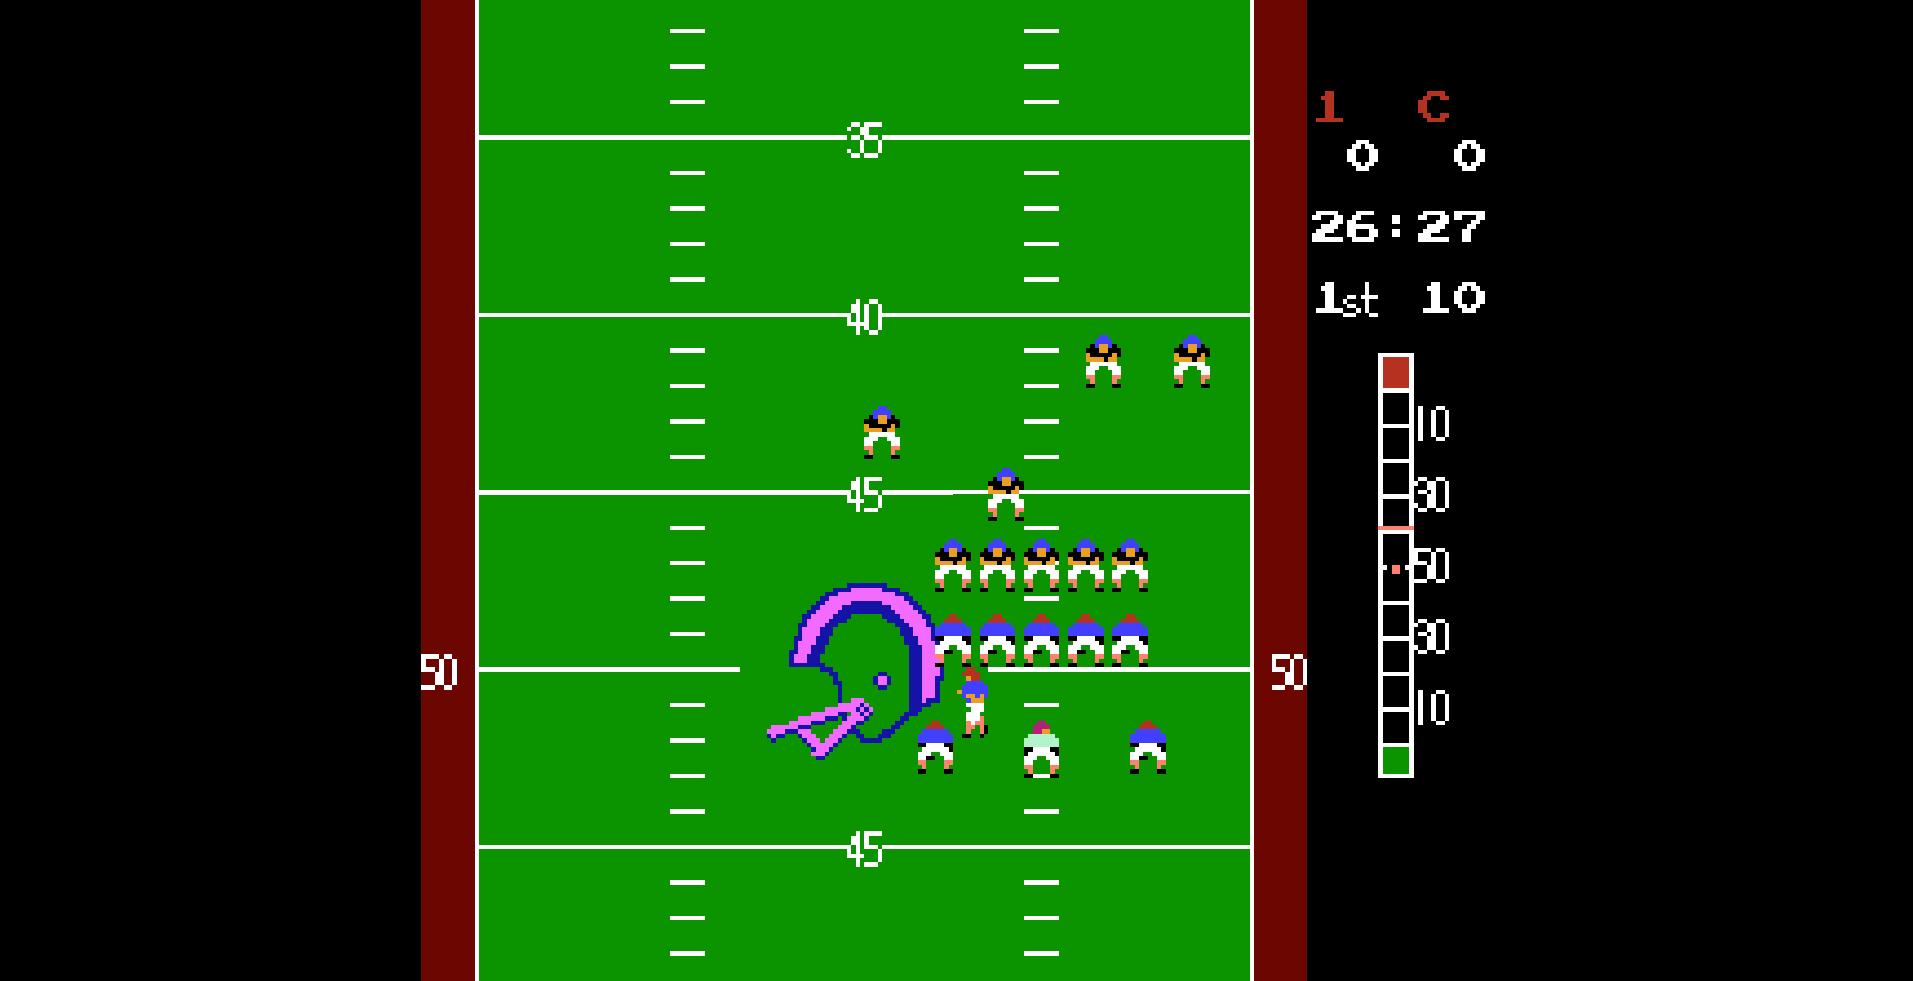 10-yard fight scrimmage